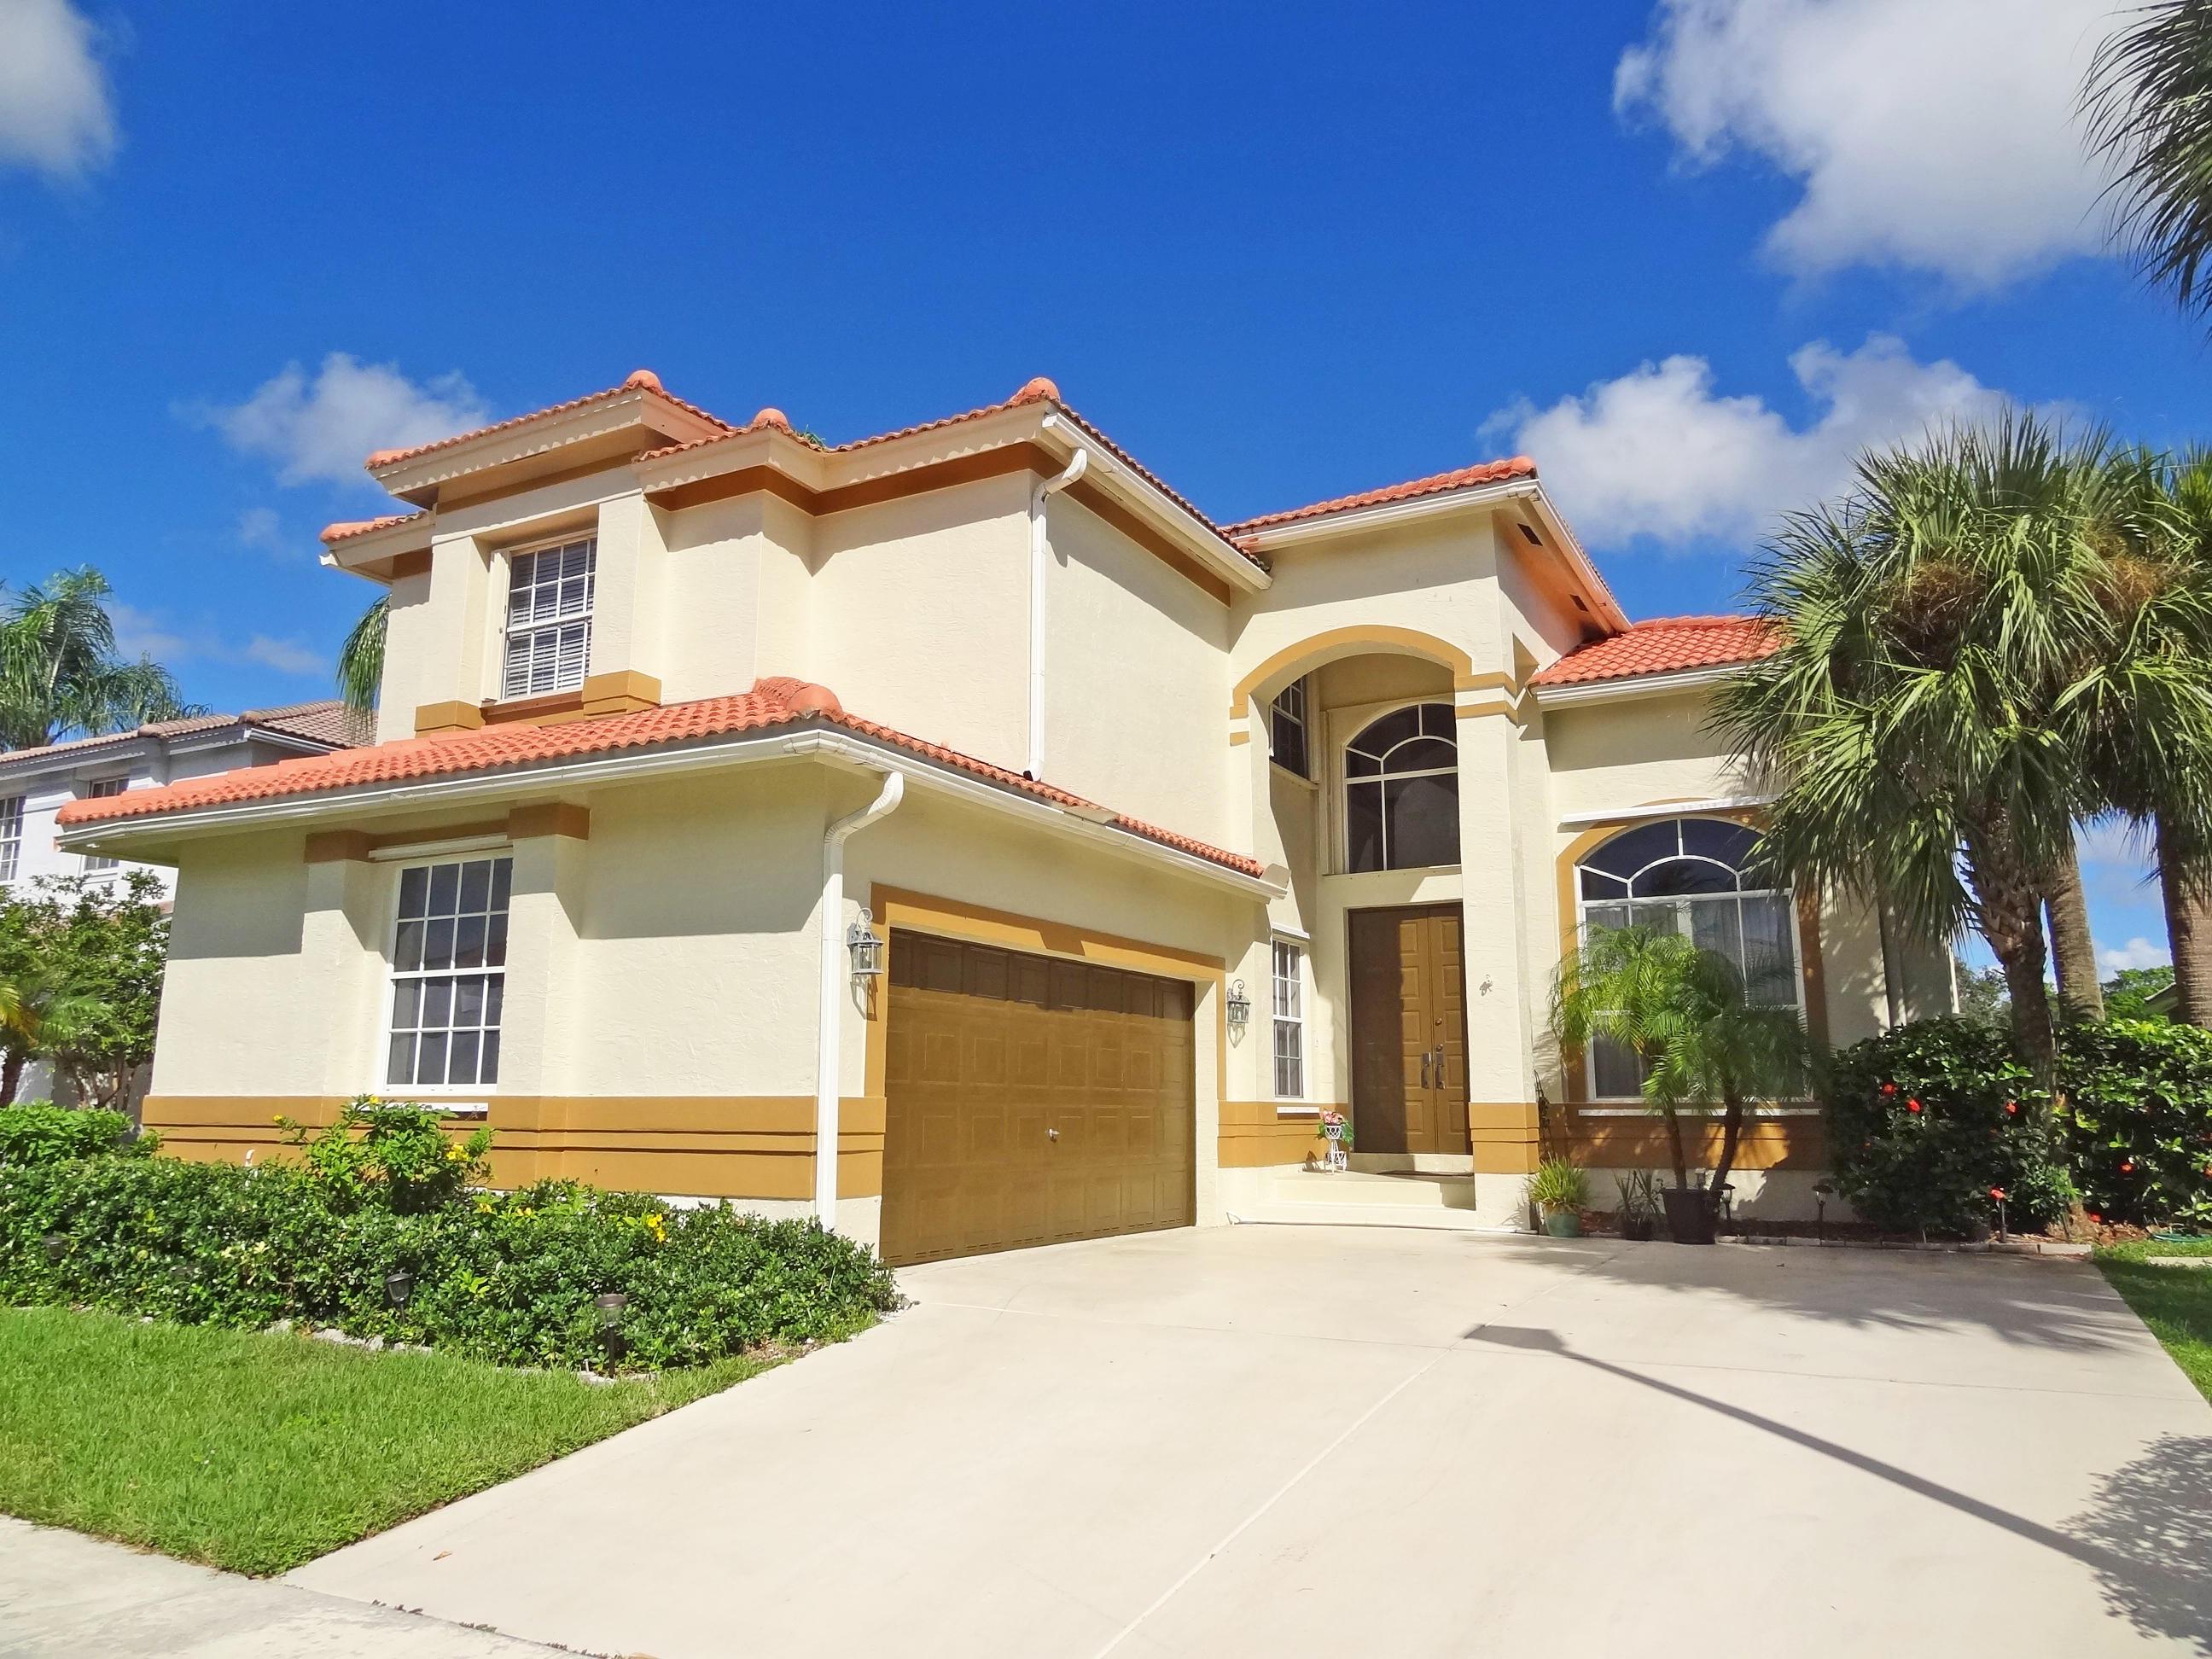 11041 Harbour Springs Circle  Boca Raton FL 33428